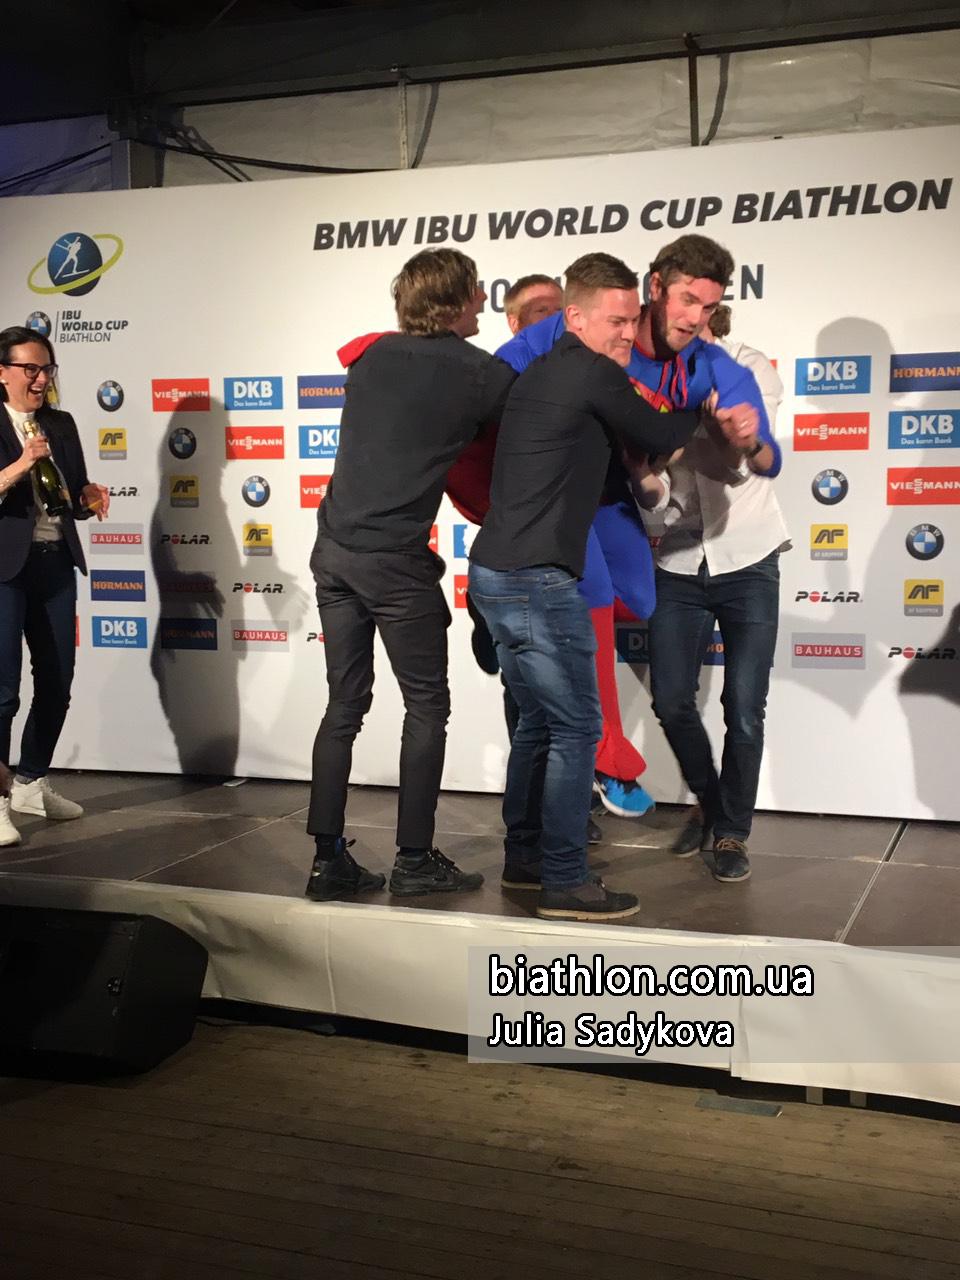 https://www.biathlon.com.ua/uploads/2019/99316.jpg